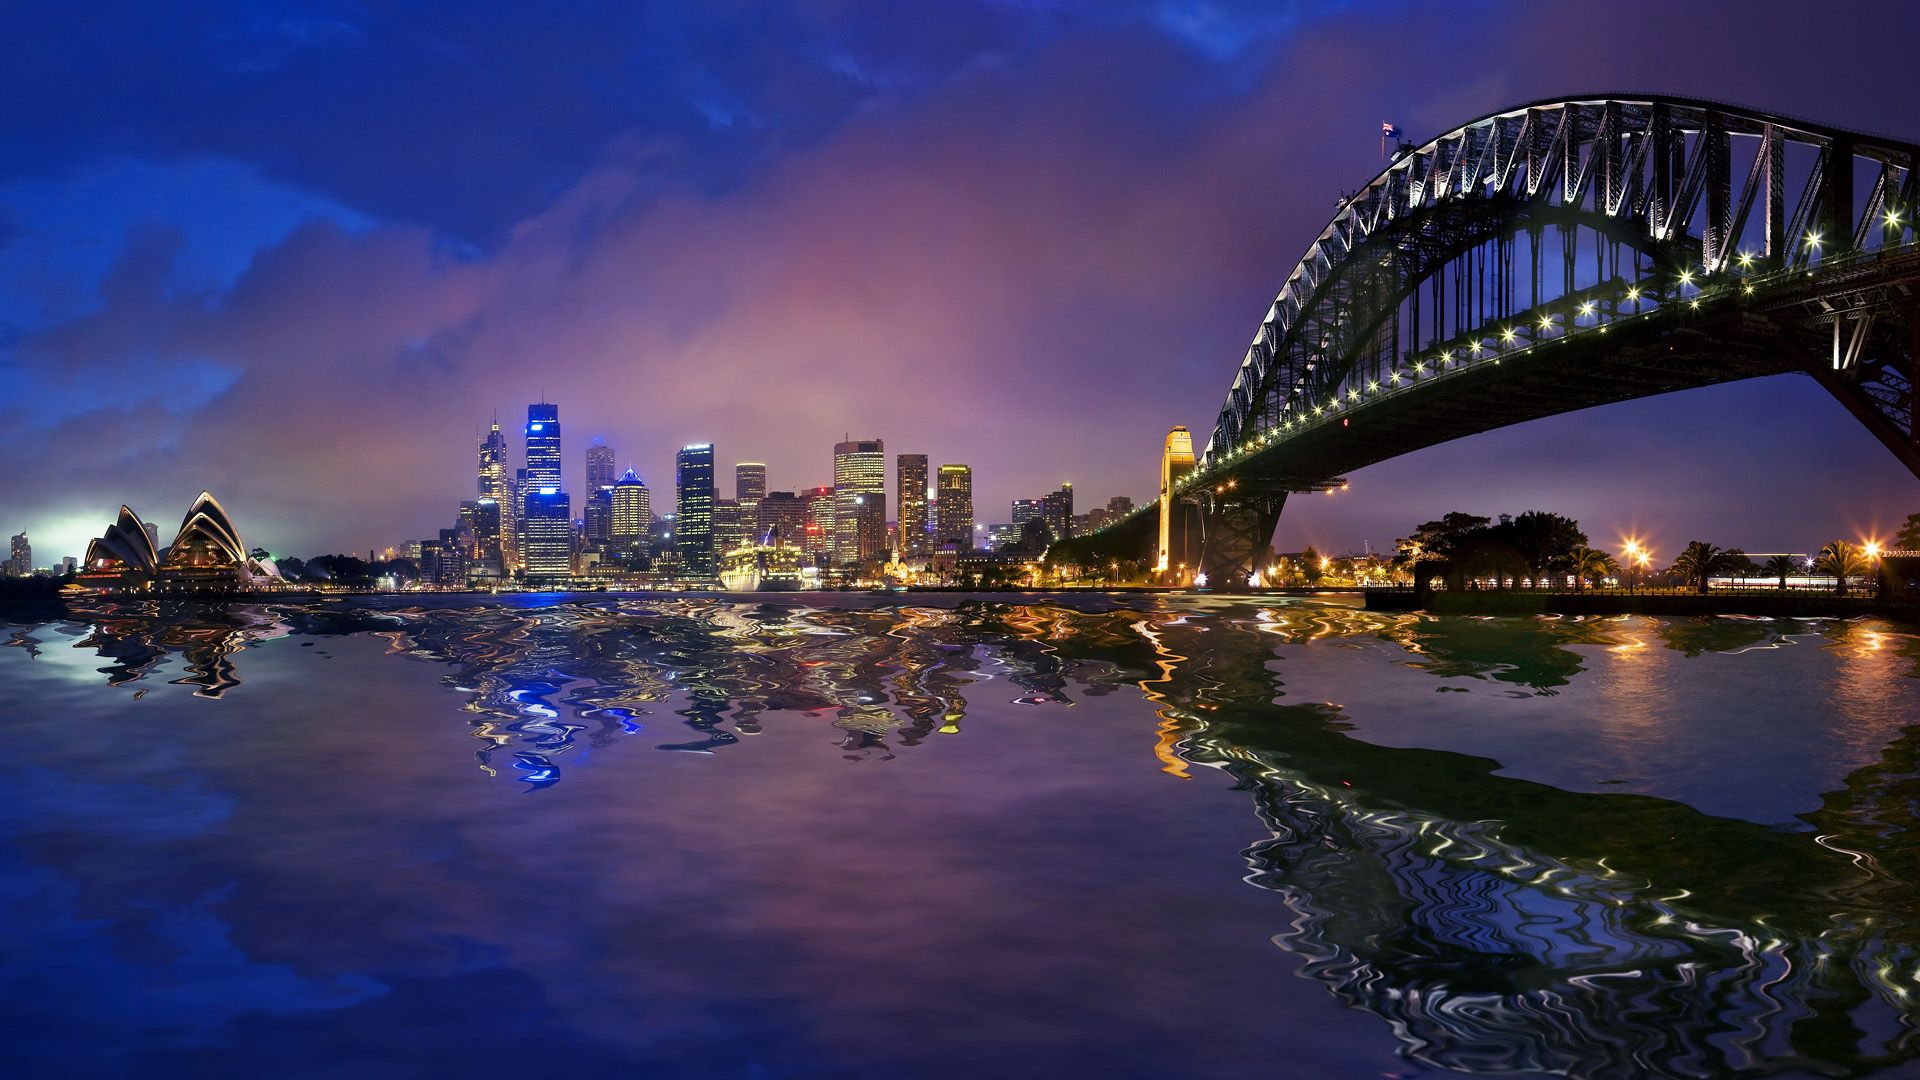 Sydney Harbour Bridge Cityscape Wallpaper Travel HD Wallpapers 1920x1080